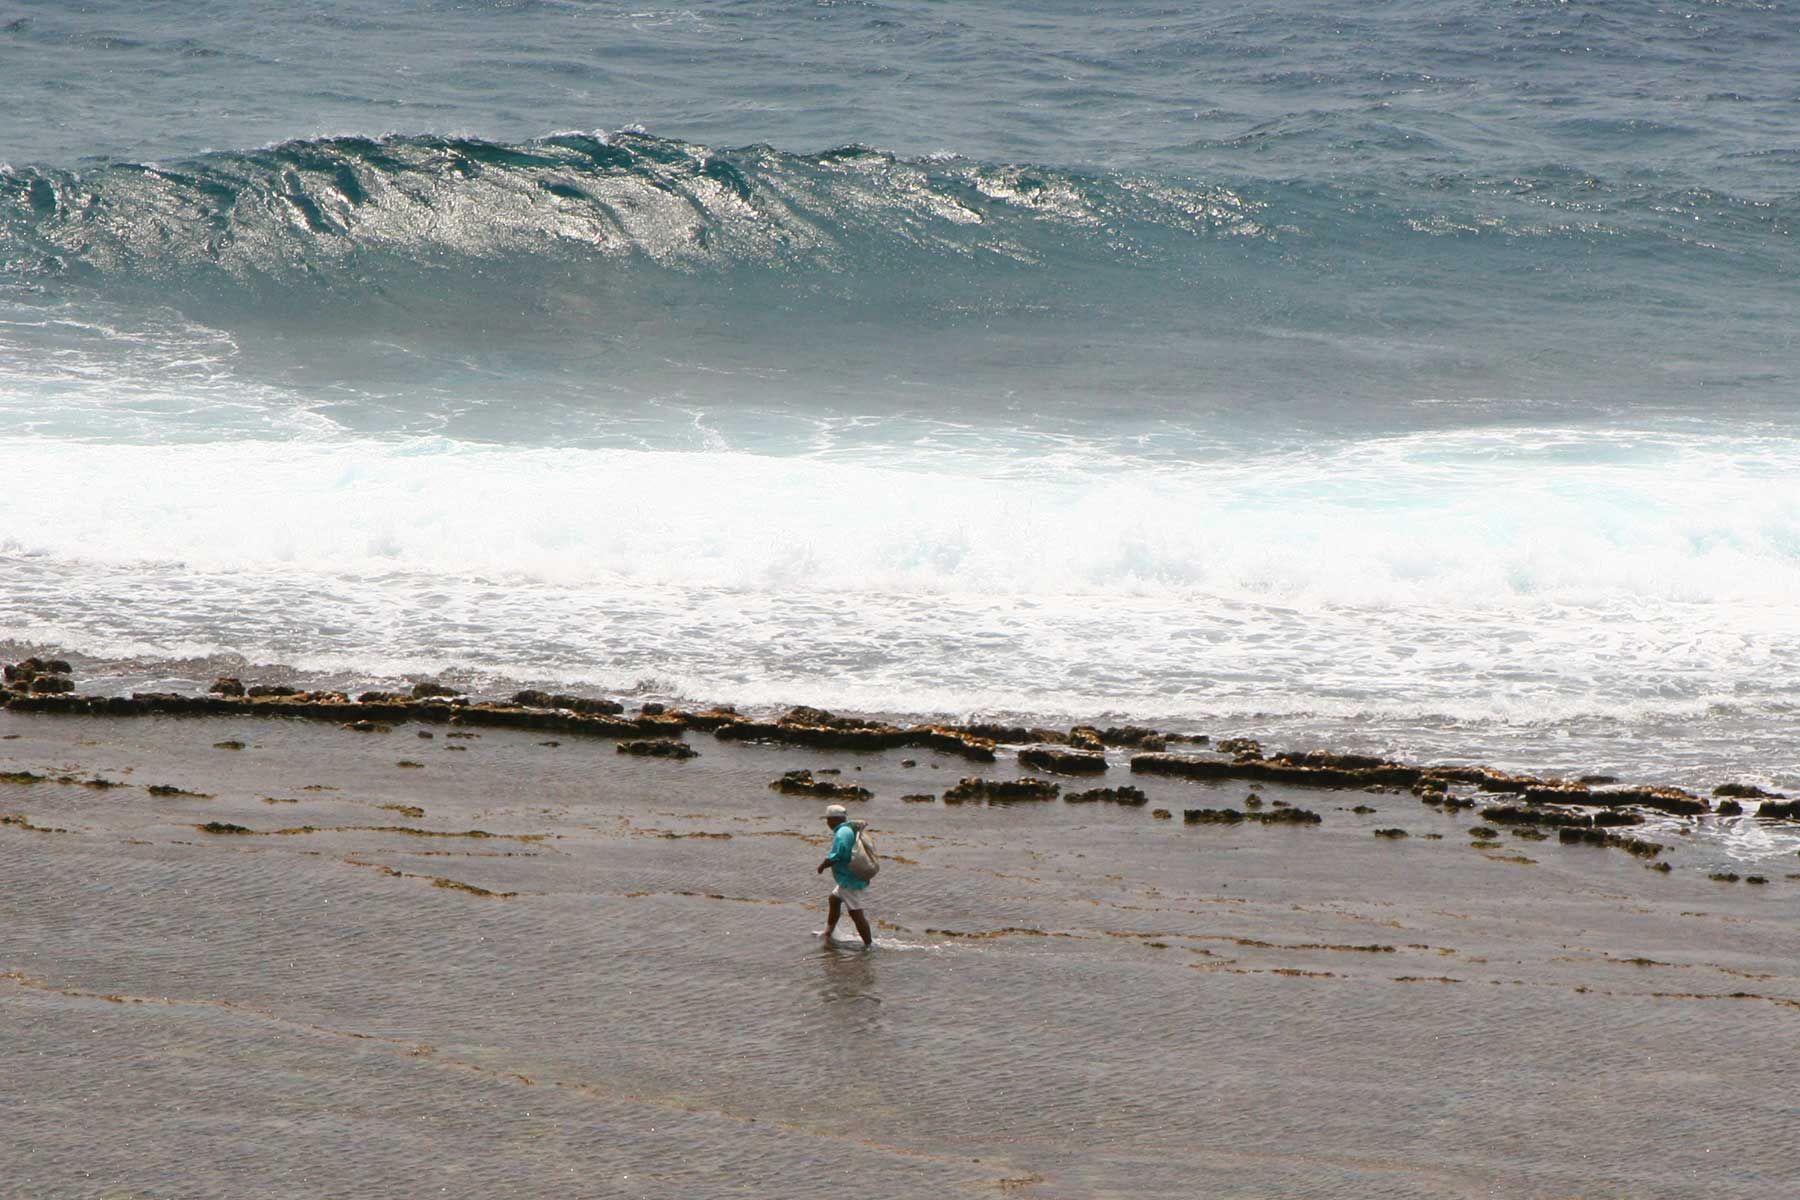 Batanes Islands Cultural Atlas - Waves - Surf - Philippines - Steven Andrew Martin - ECAI